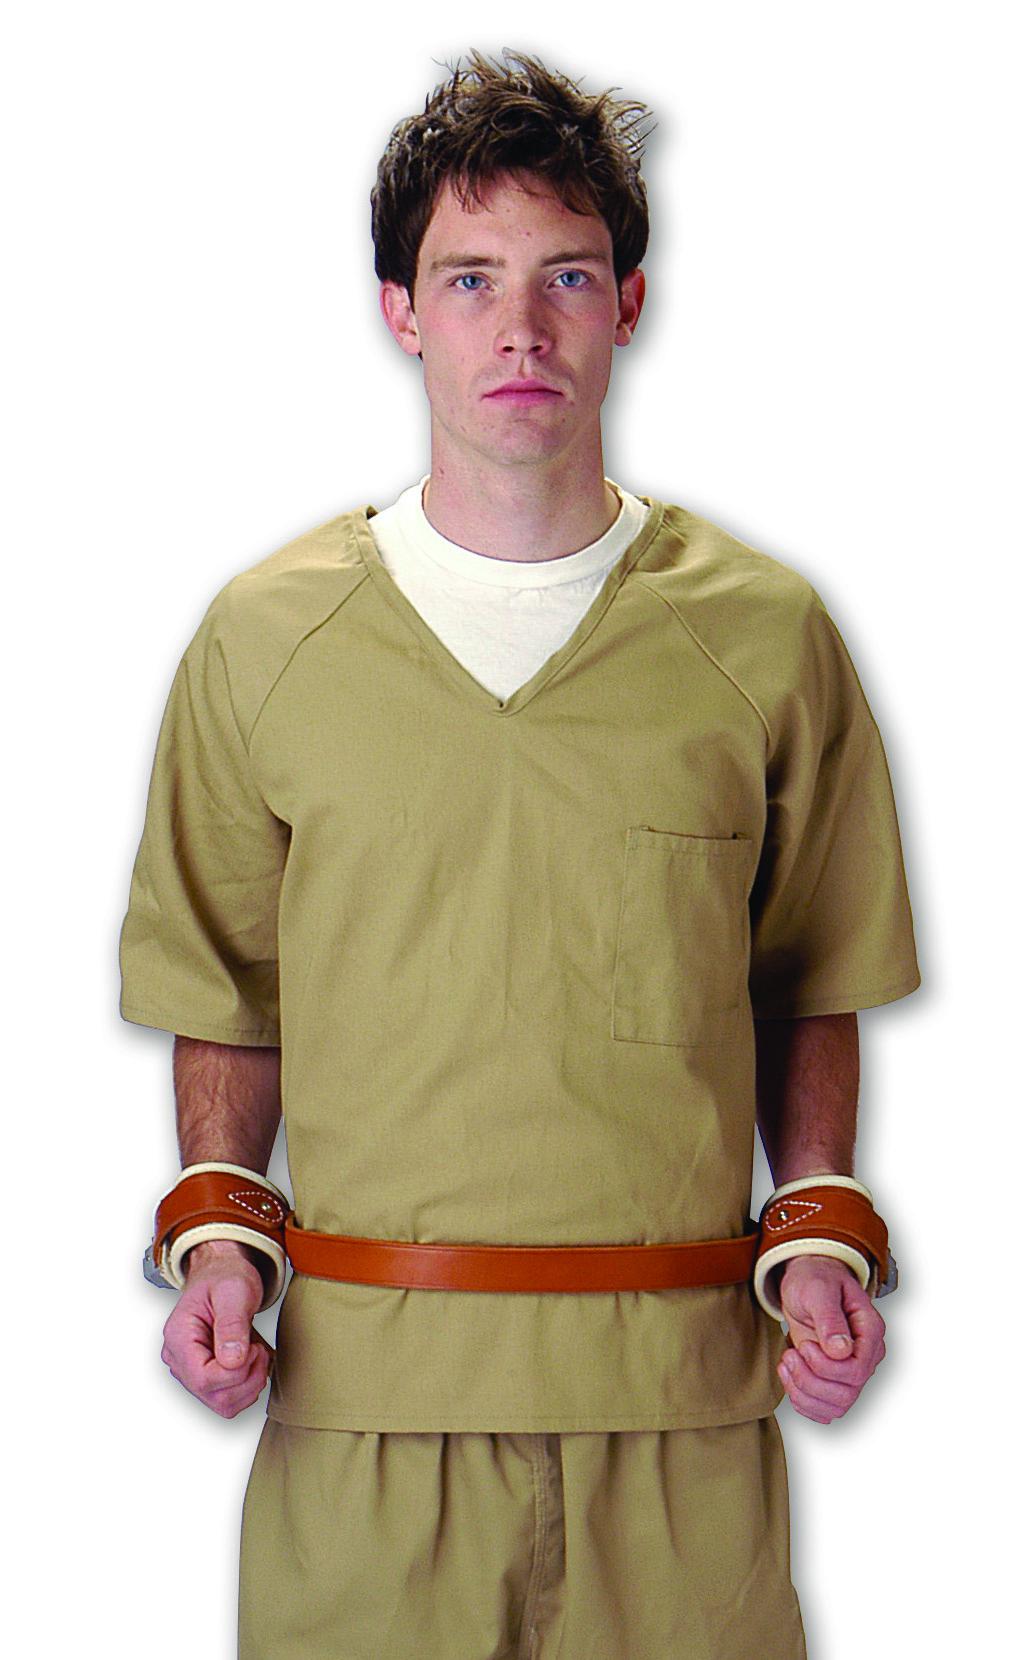 Adjustable Wrist To Waist Restraint 243 00